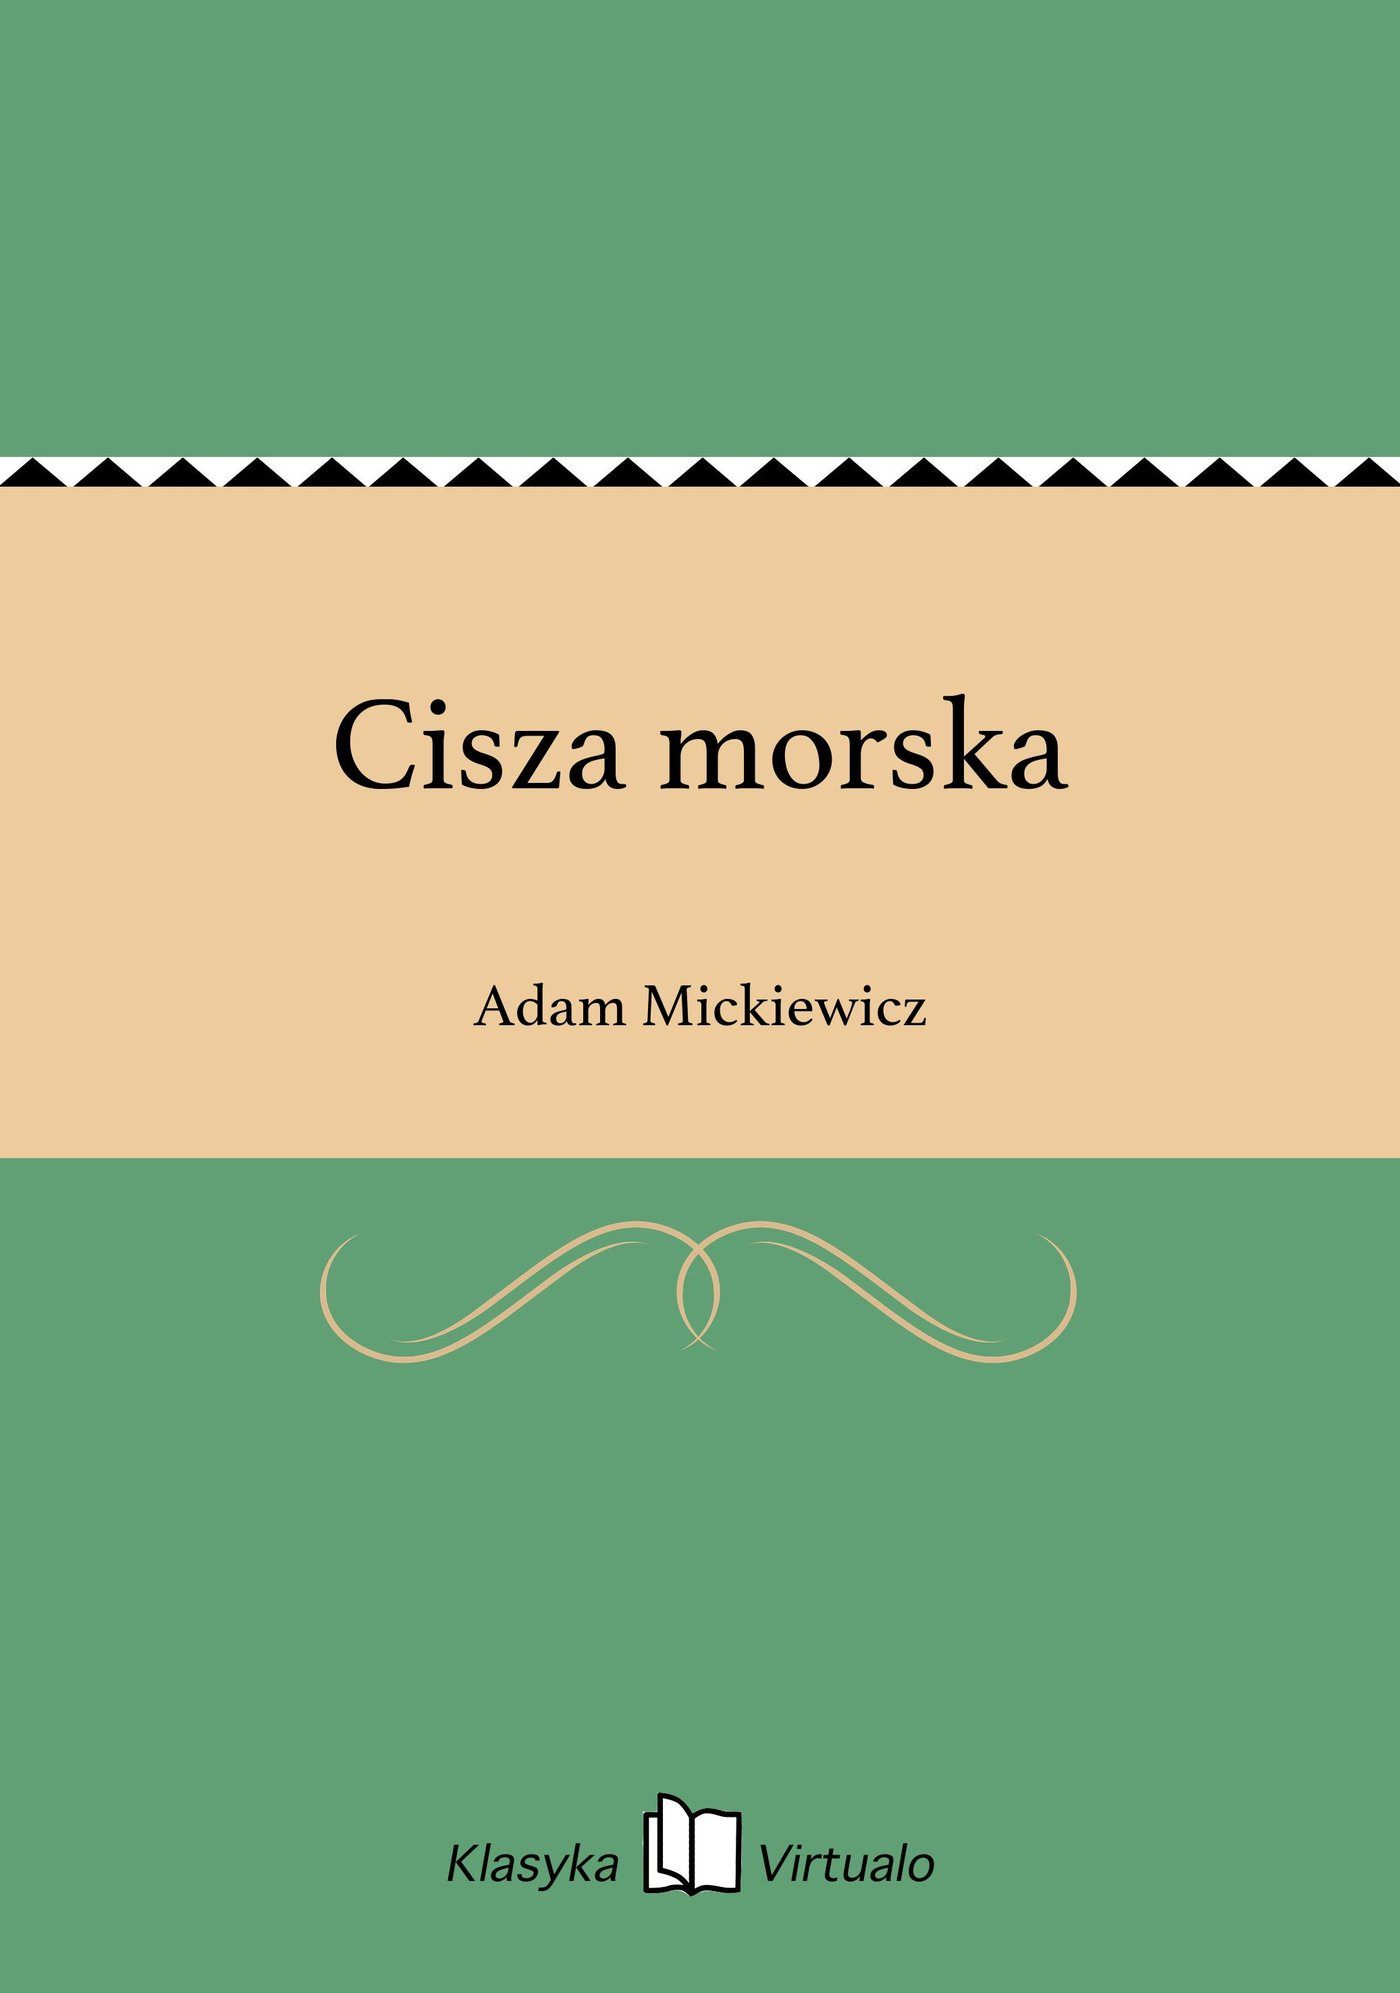 Cisza morska - Ebook (Książka na Kindle) do pobrania w formacie MOBI